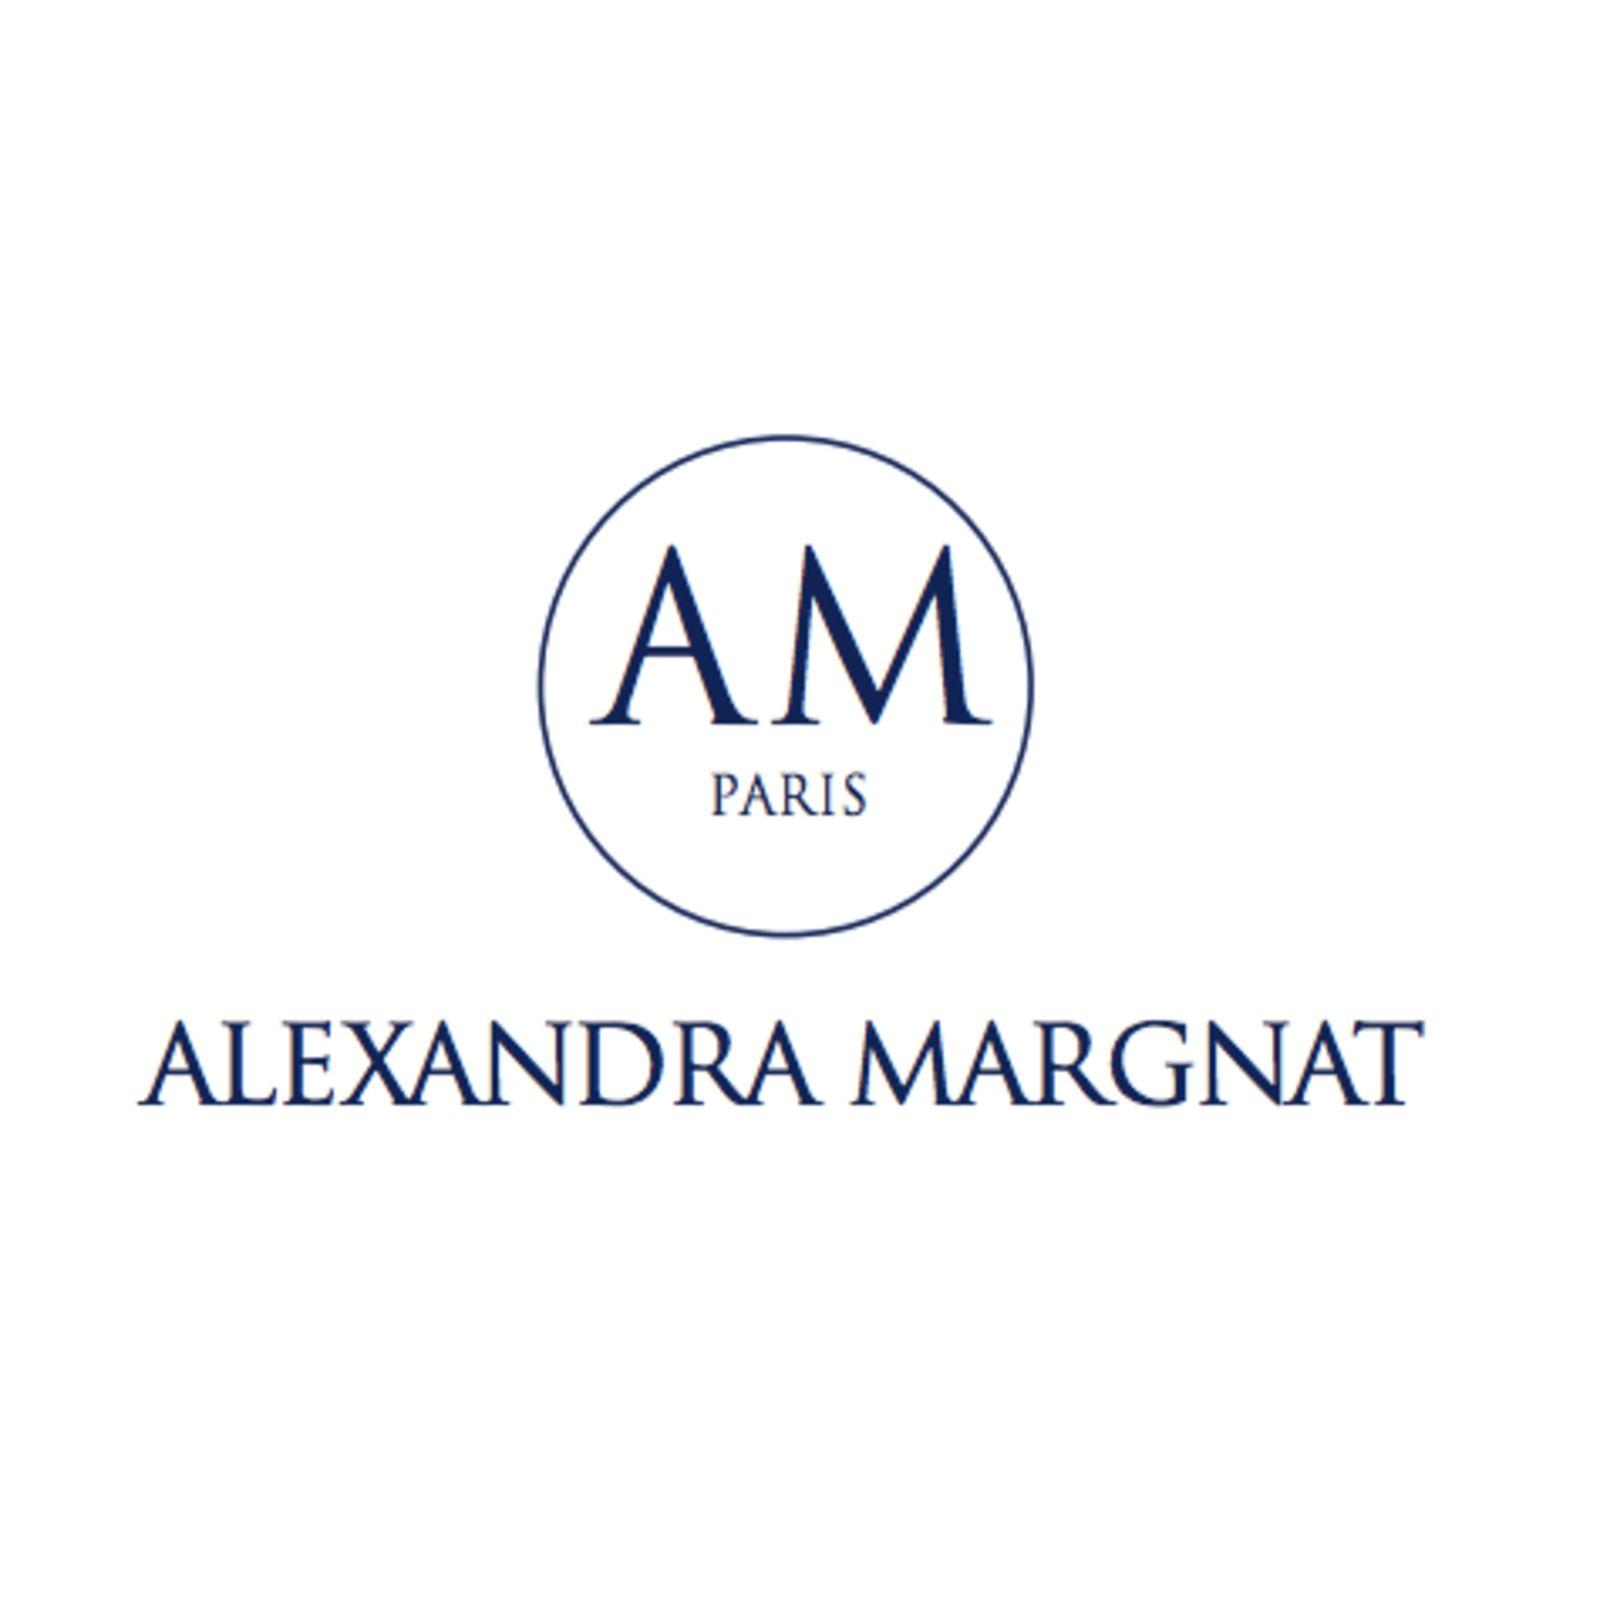 ALEXANDRA MARGNAT